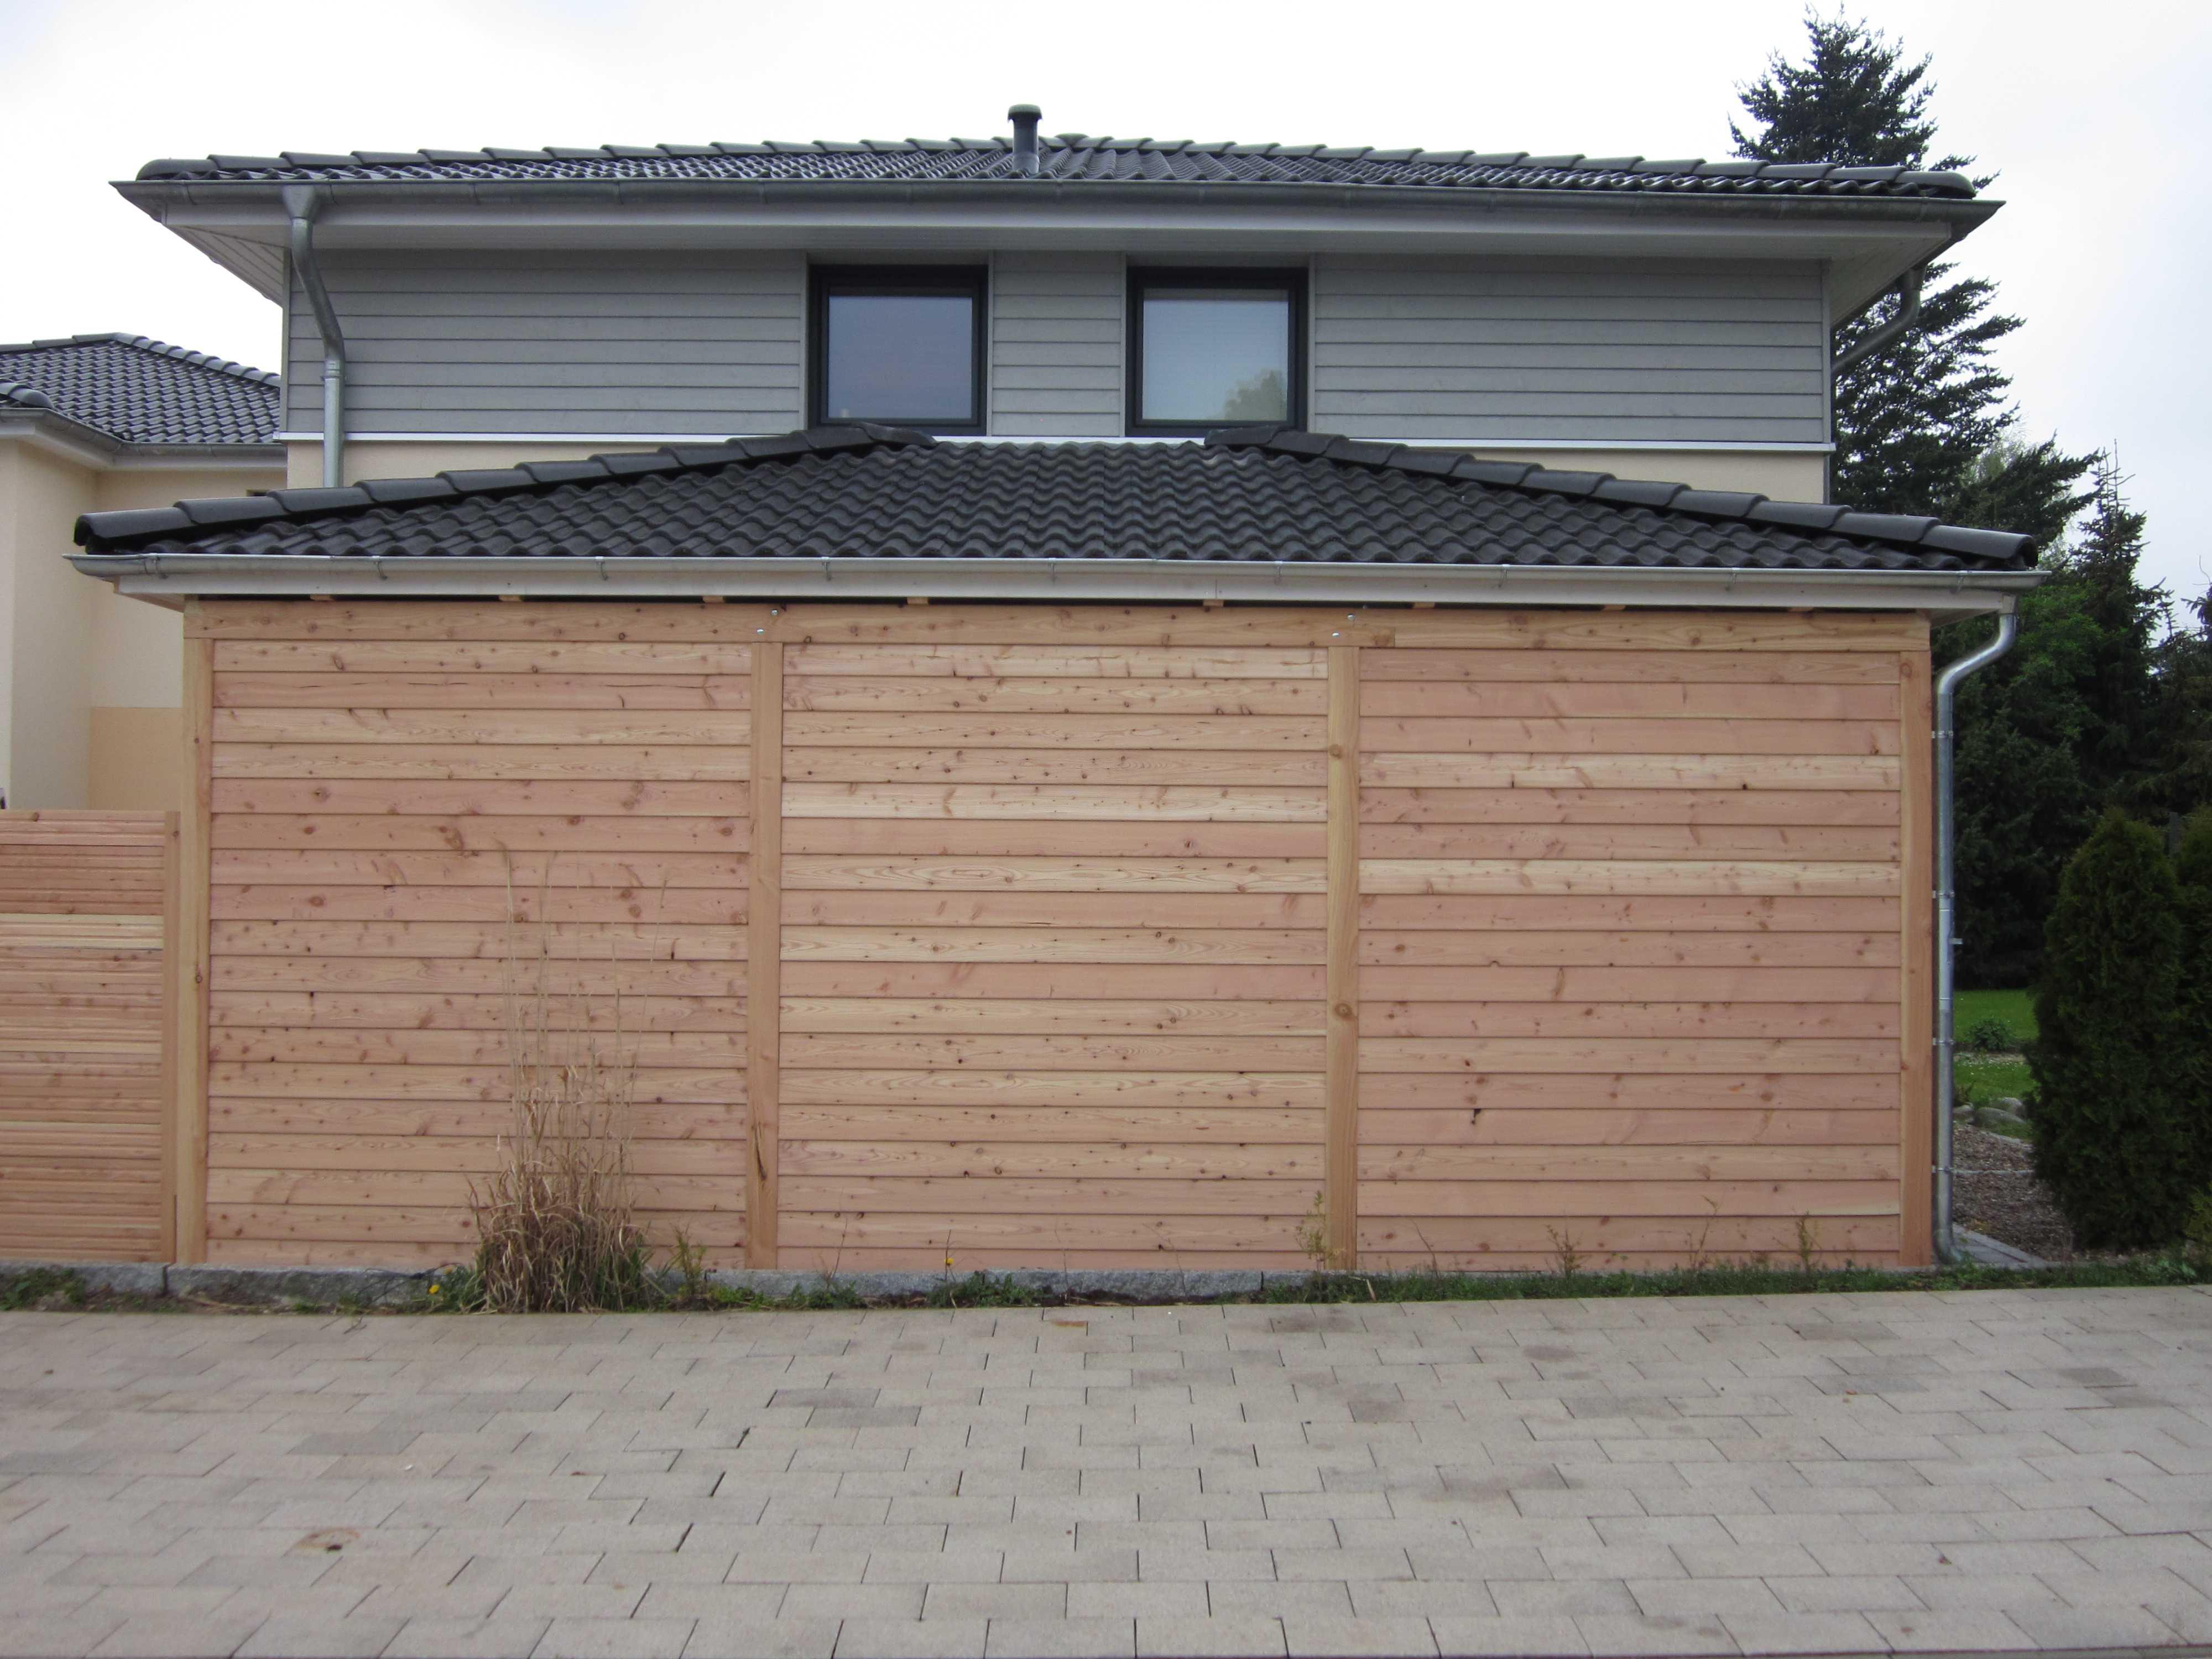 Carport mit Walmdach modern in naturbelassenem Lärchenholz